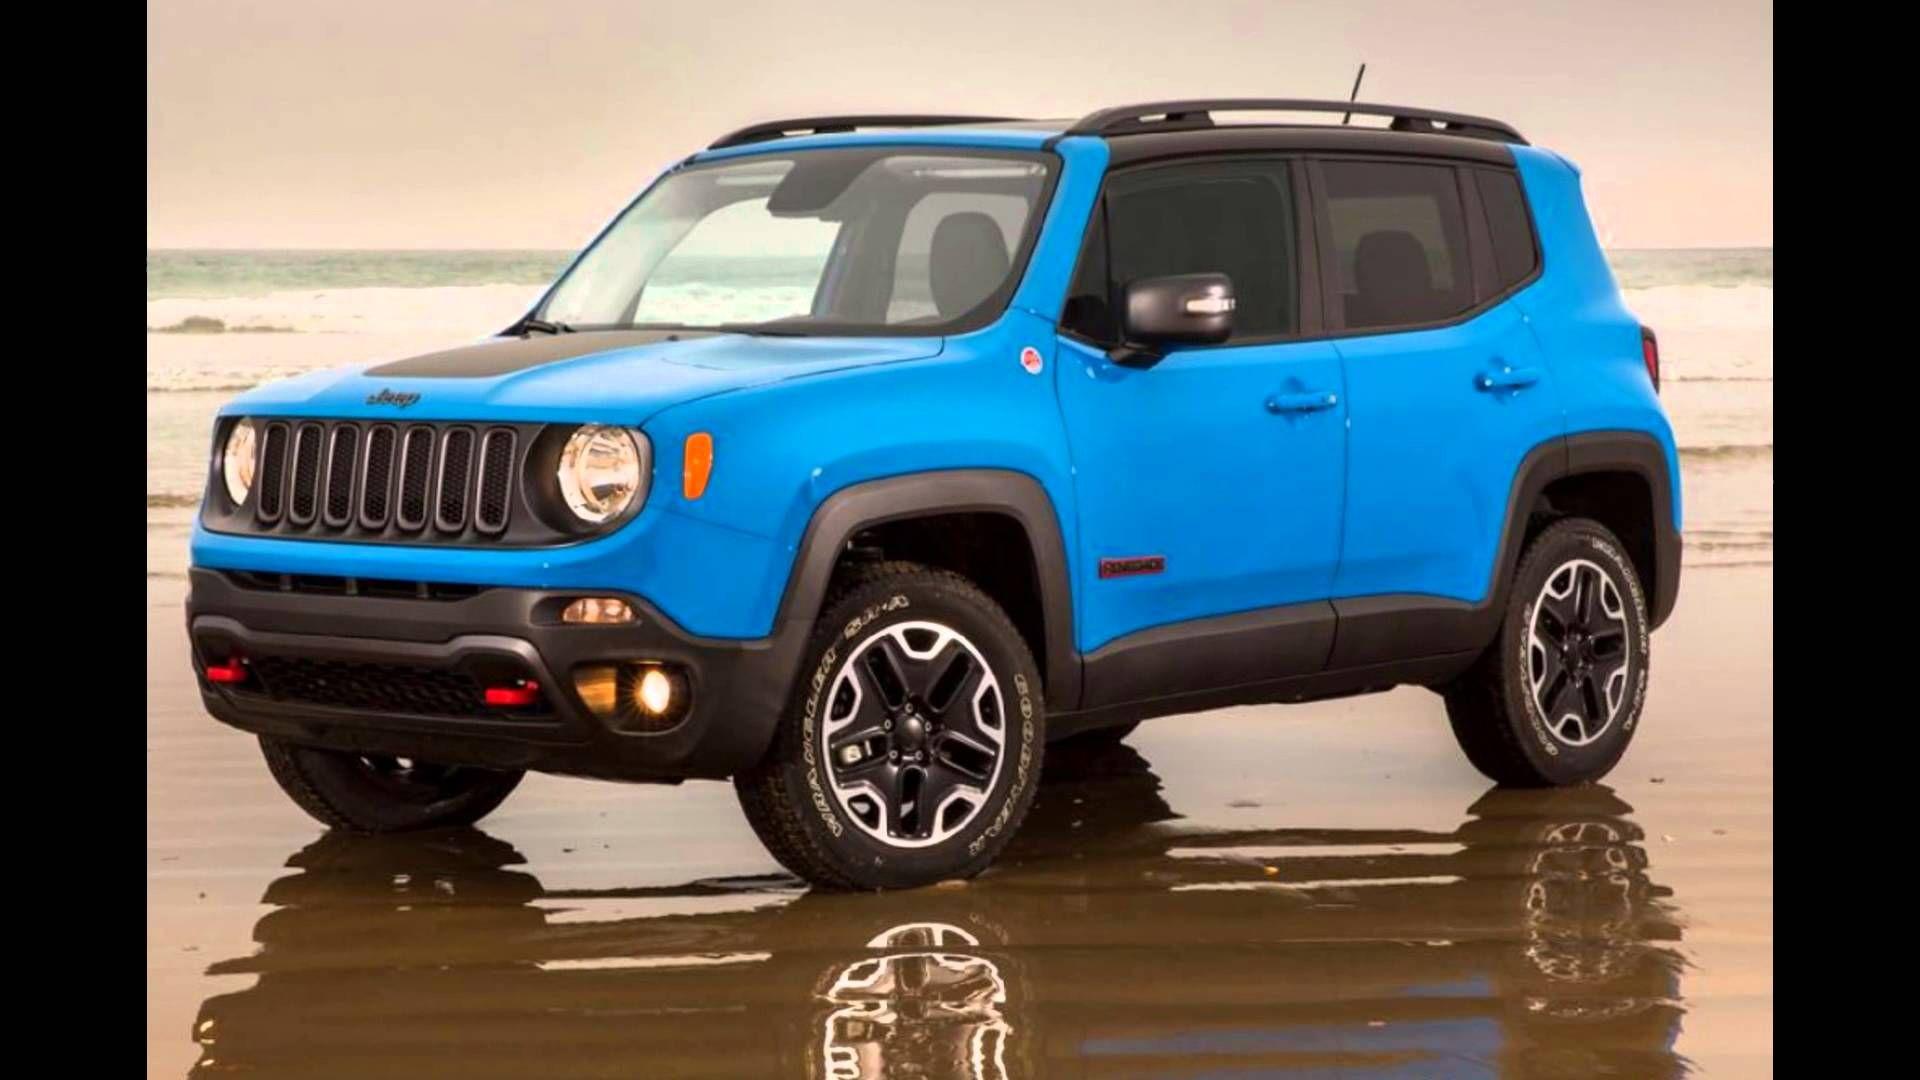 Awesome Jeep Renegade Blue 2015 Jeep Renegade Jeep Renegade